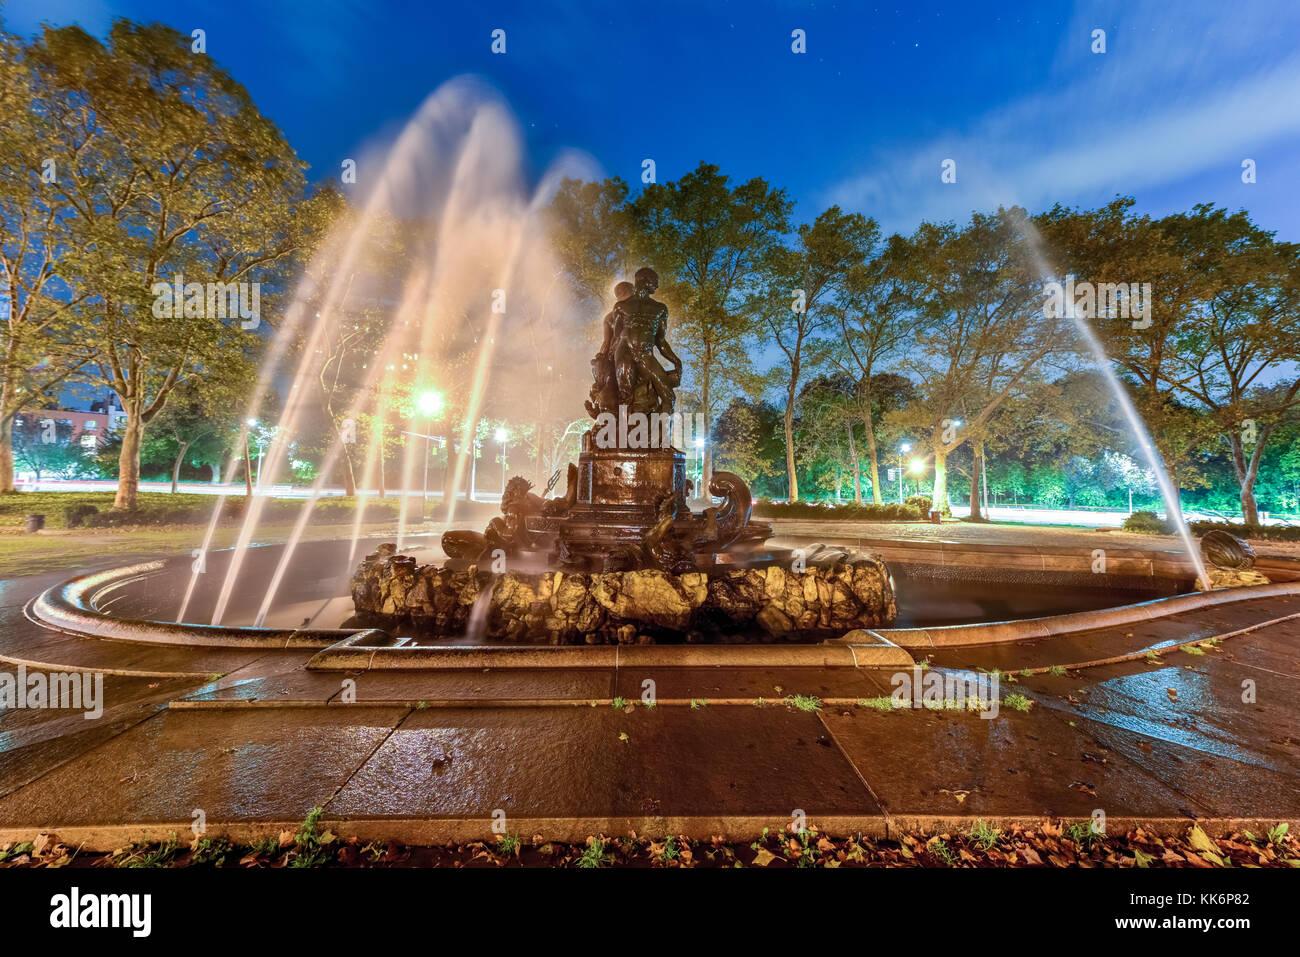 Bailey est une fontaine 19e siècle sculpture en plein air à new york Grand Army Plaza, à Brooklyn, Photo Stock